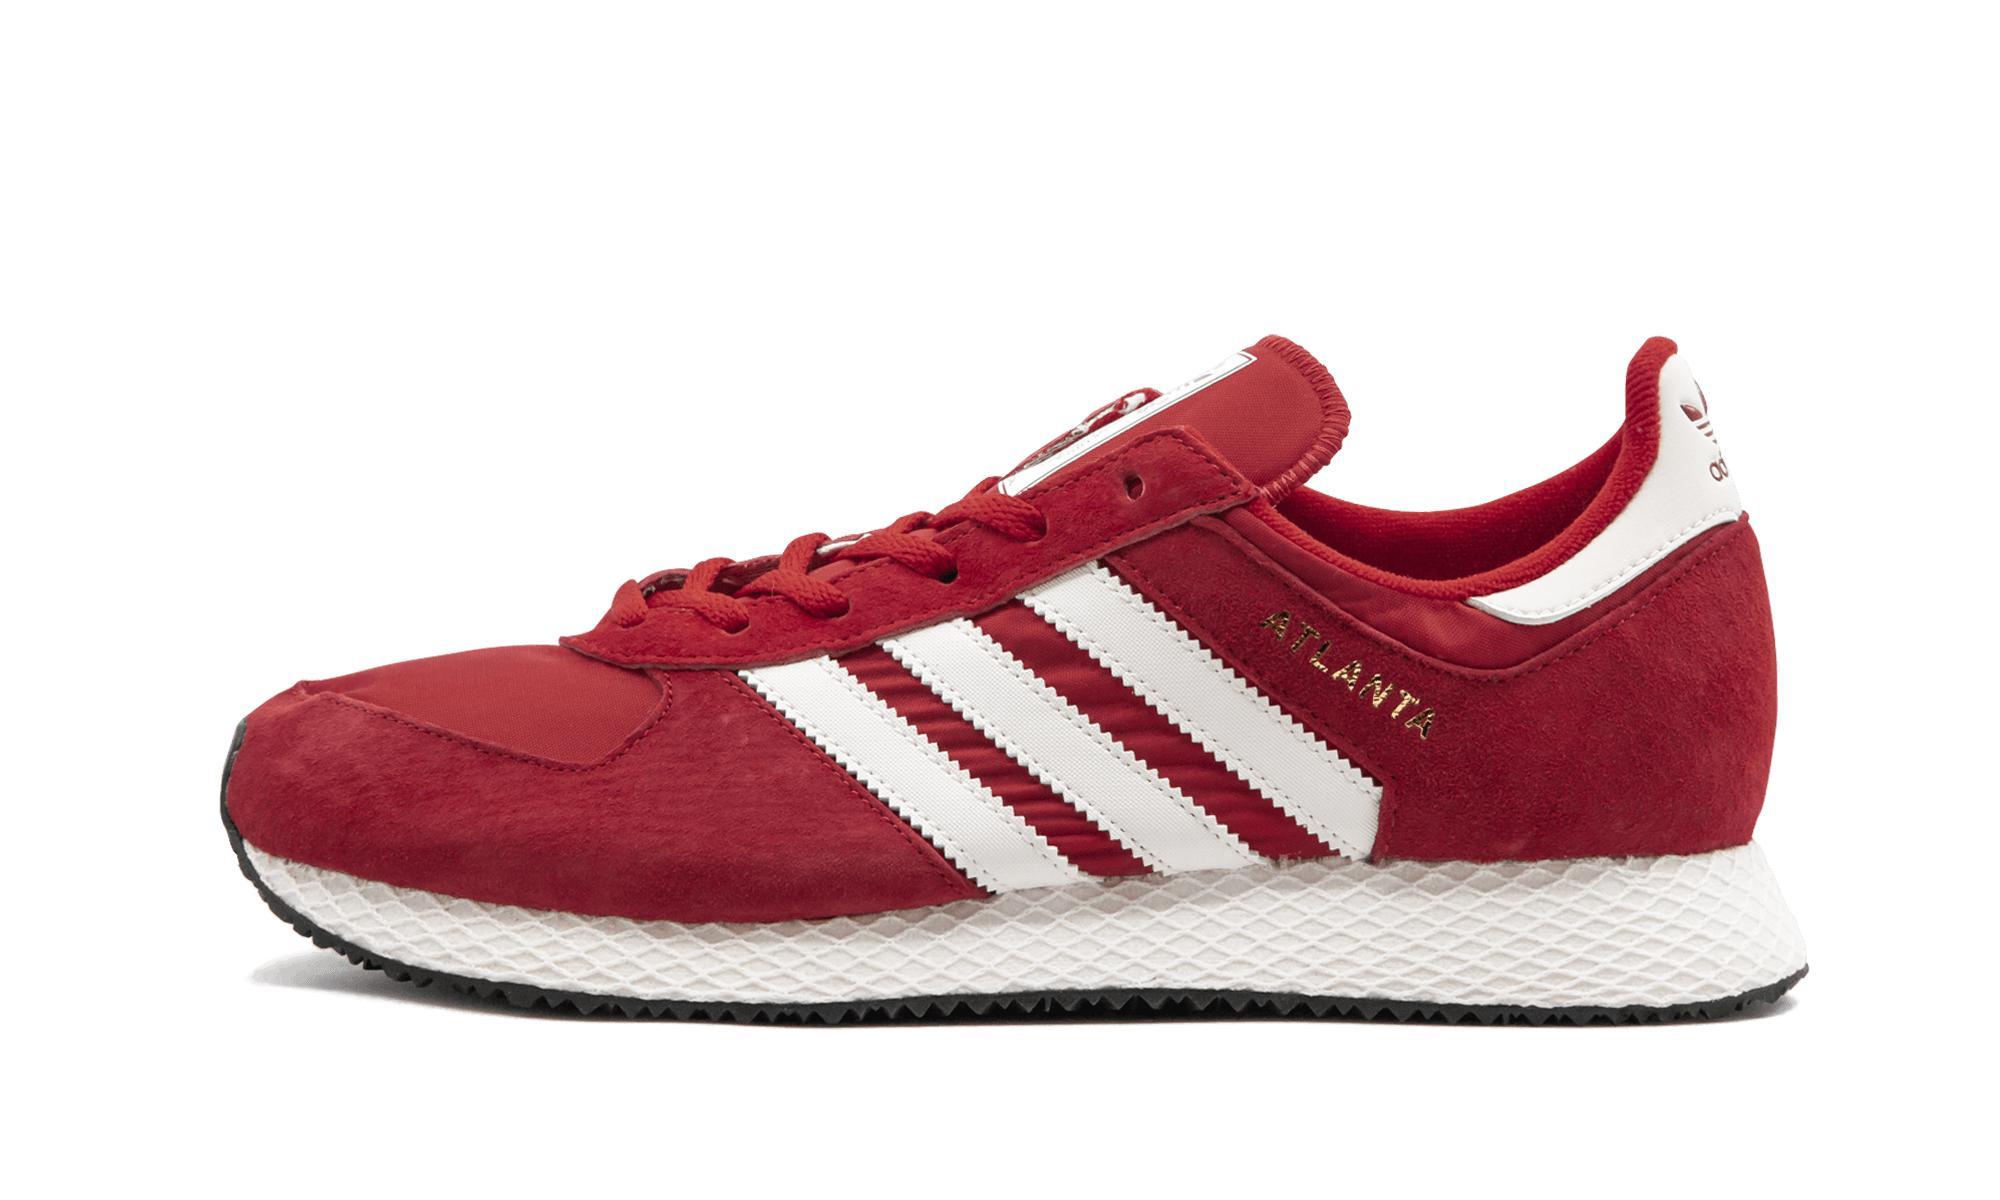 best sneakers 52ba6 18cc2 Adidas vermelho Atlanta homens Spzl para Lyst em zU7xq1qw